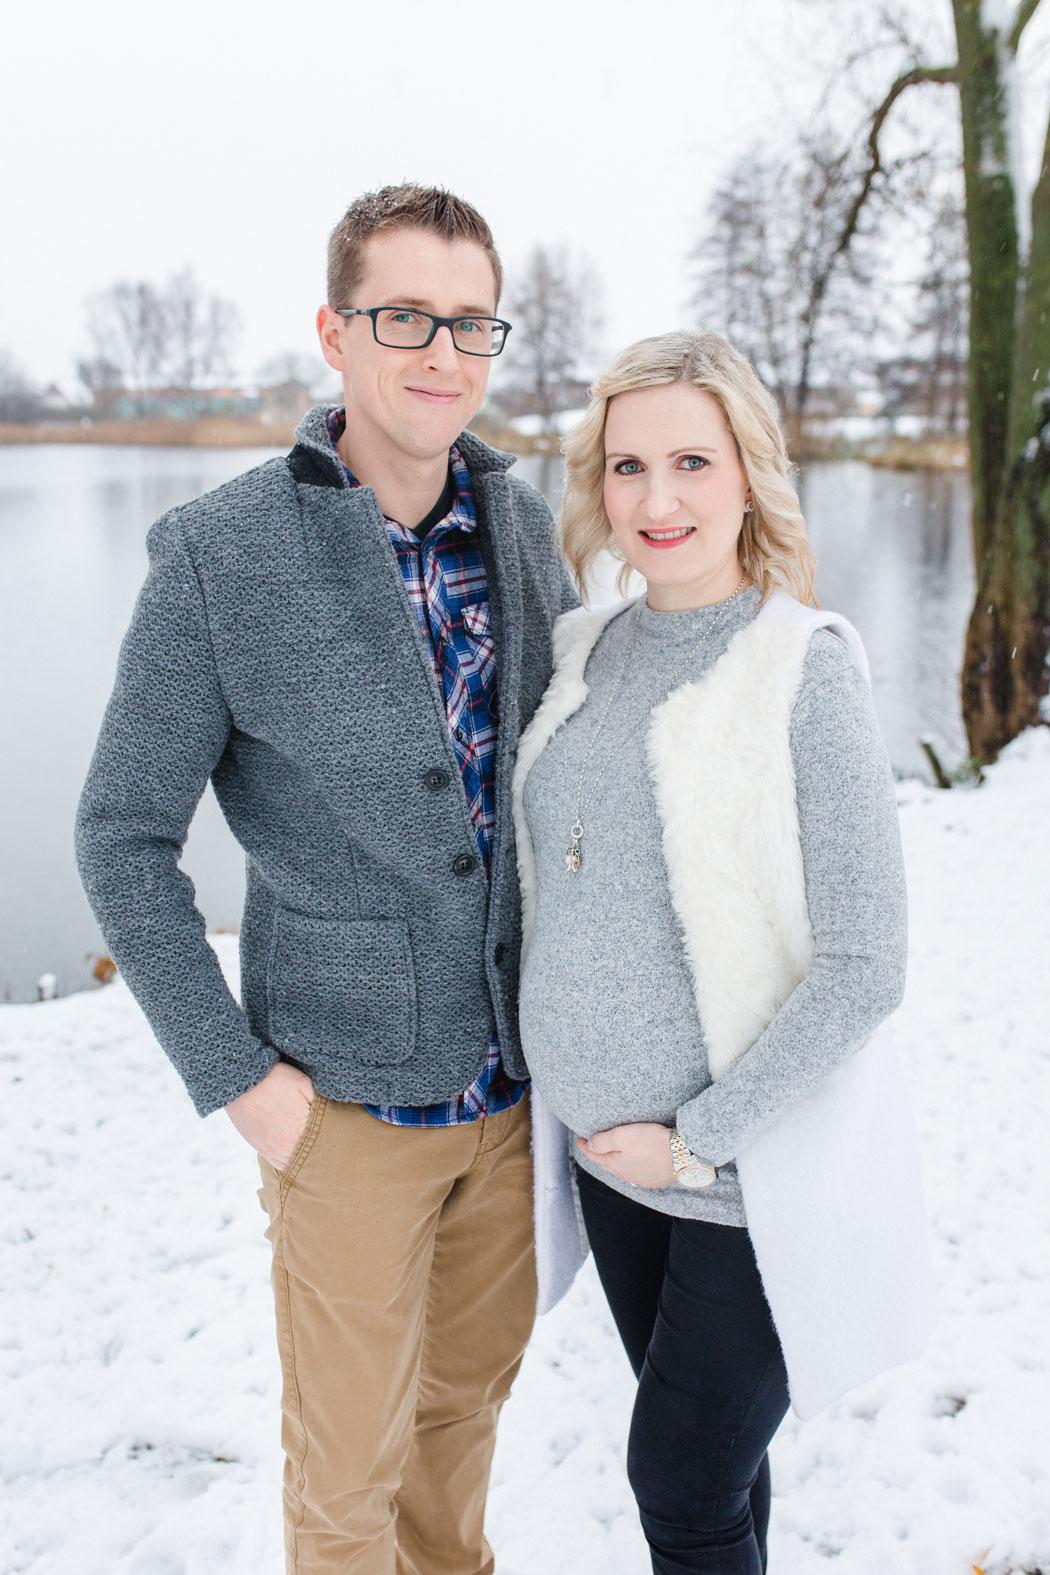 mareike wiesner photography babybauchshootingshooting anja 008 - Babybauchshooting in Salzgitter - Anja